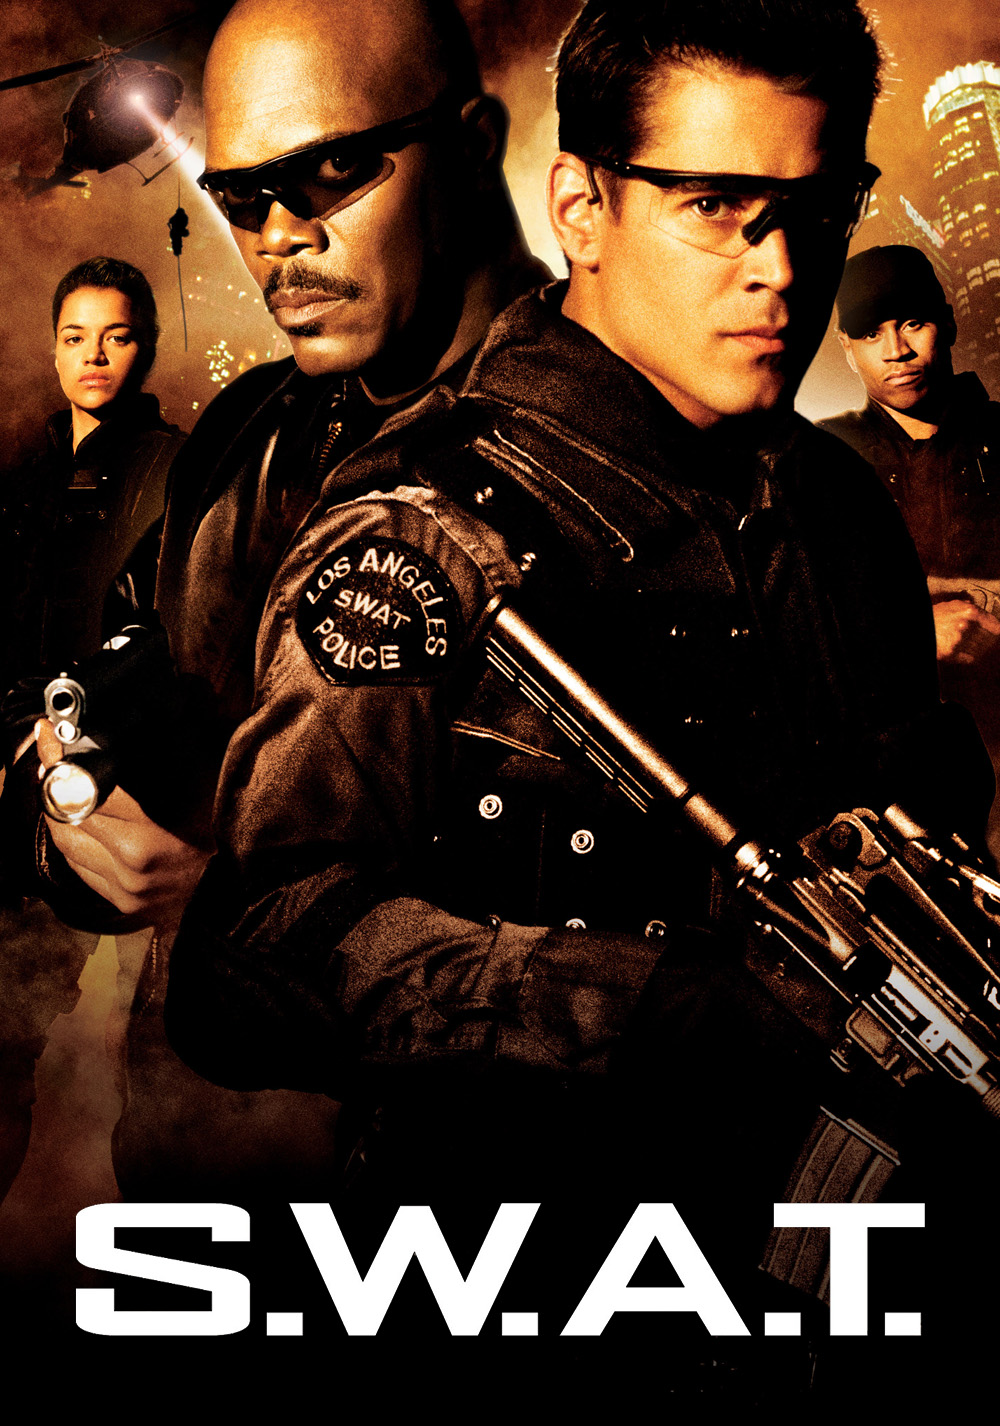 Swat Film